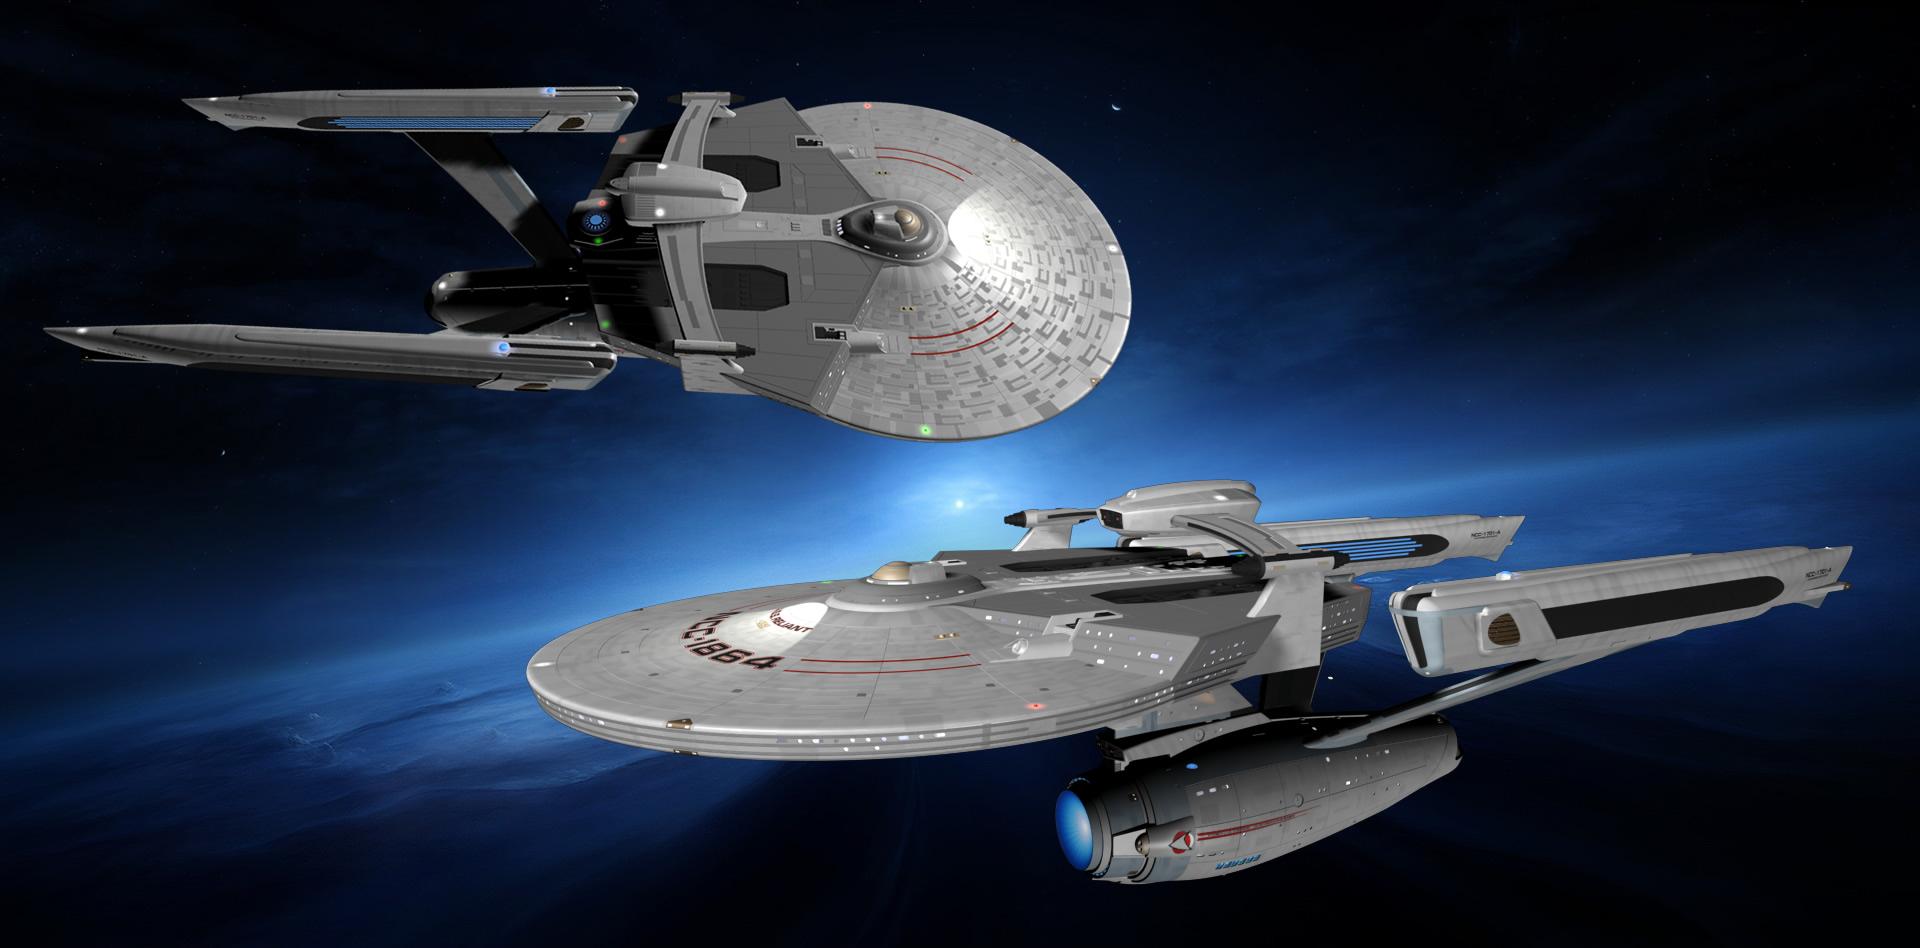 Gaia/Tartan Class Starship by SlingBlade87 on DeviantArt